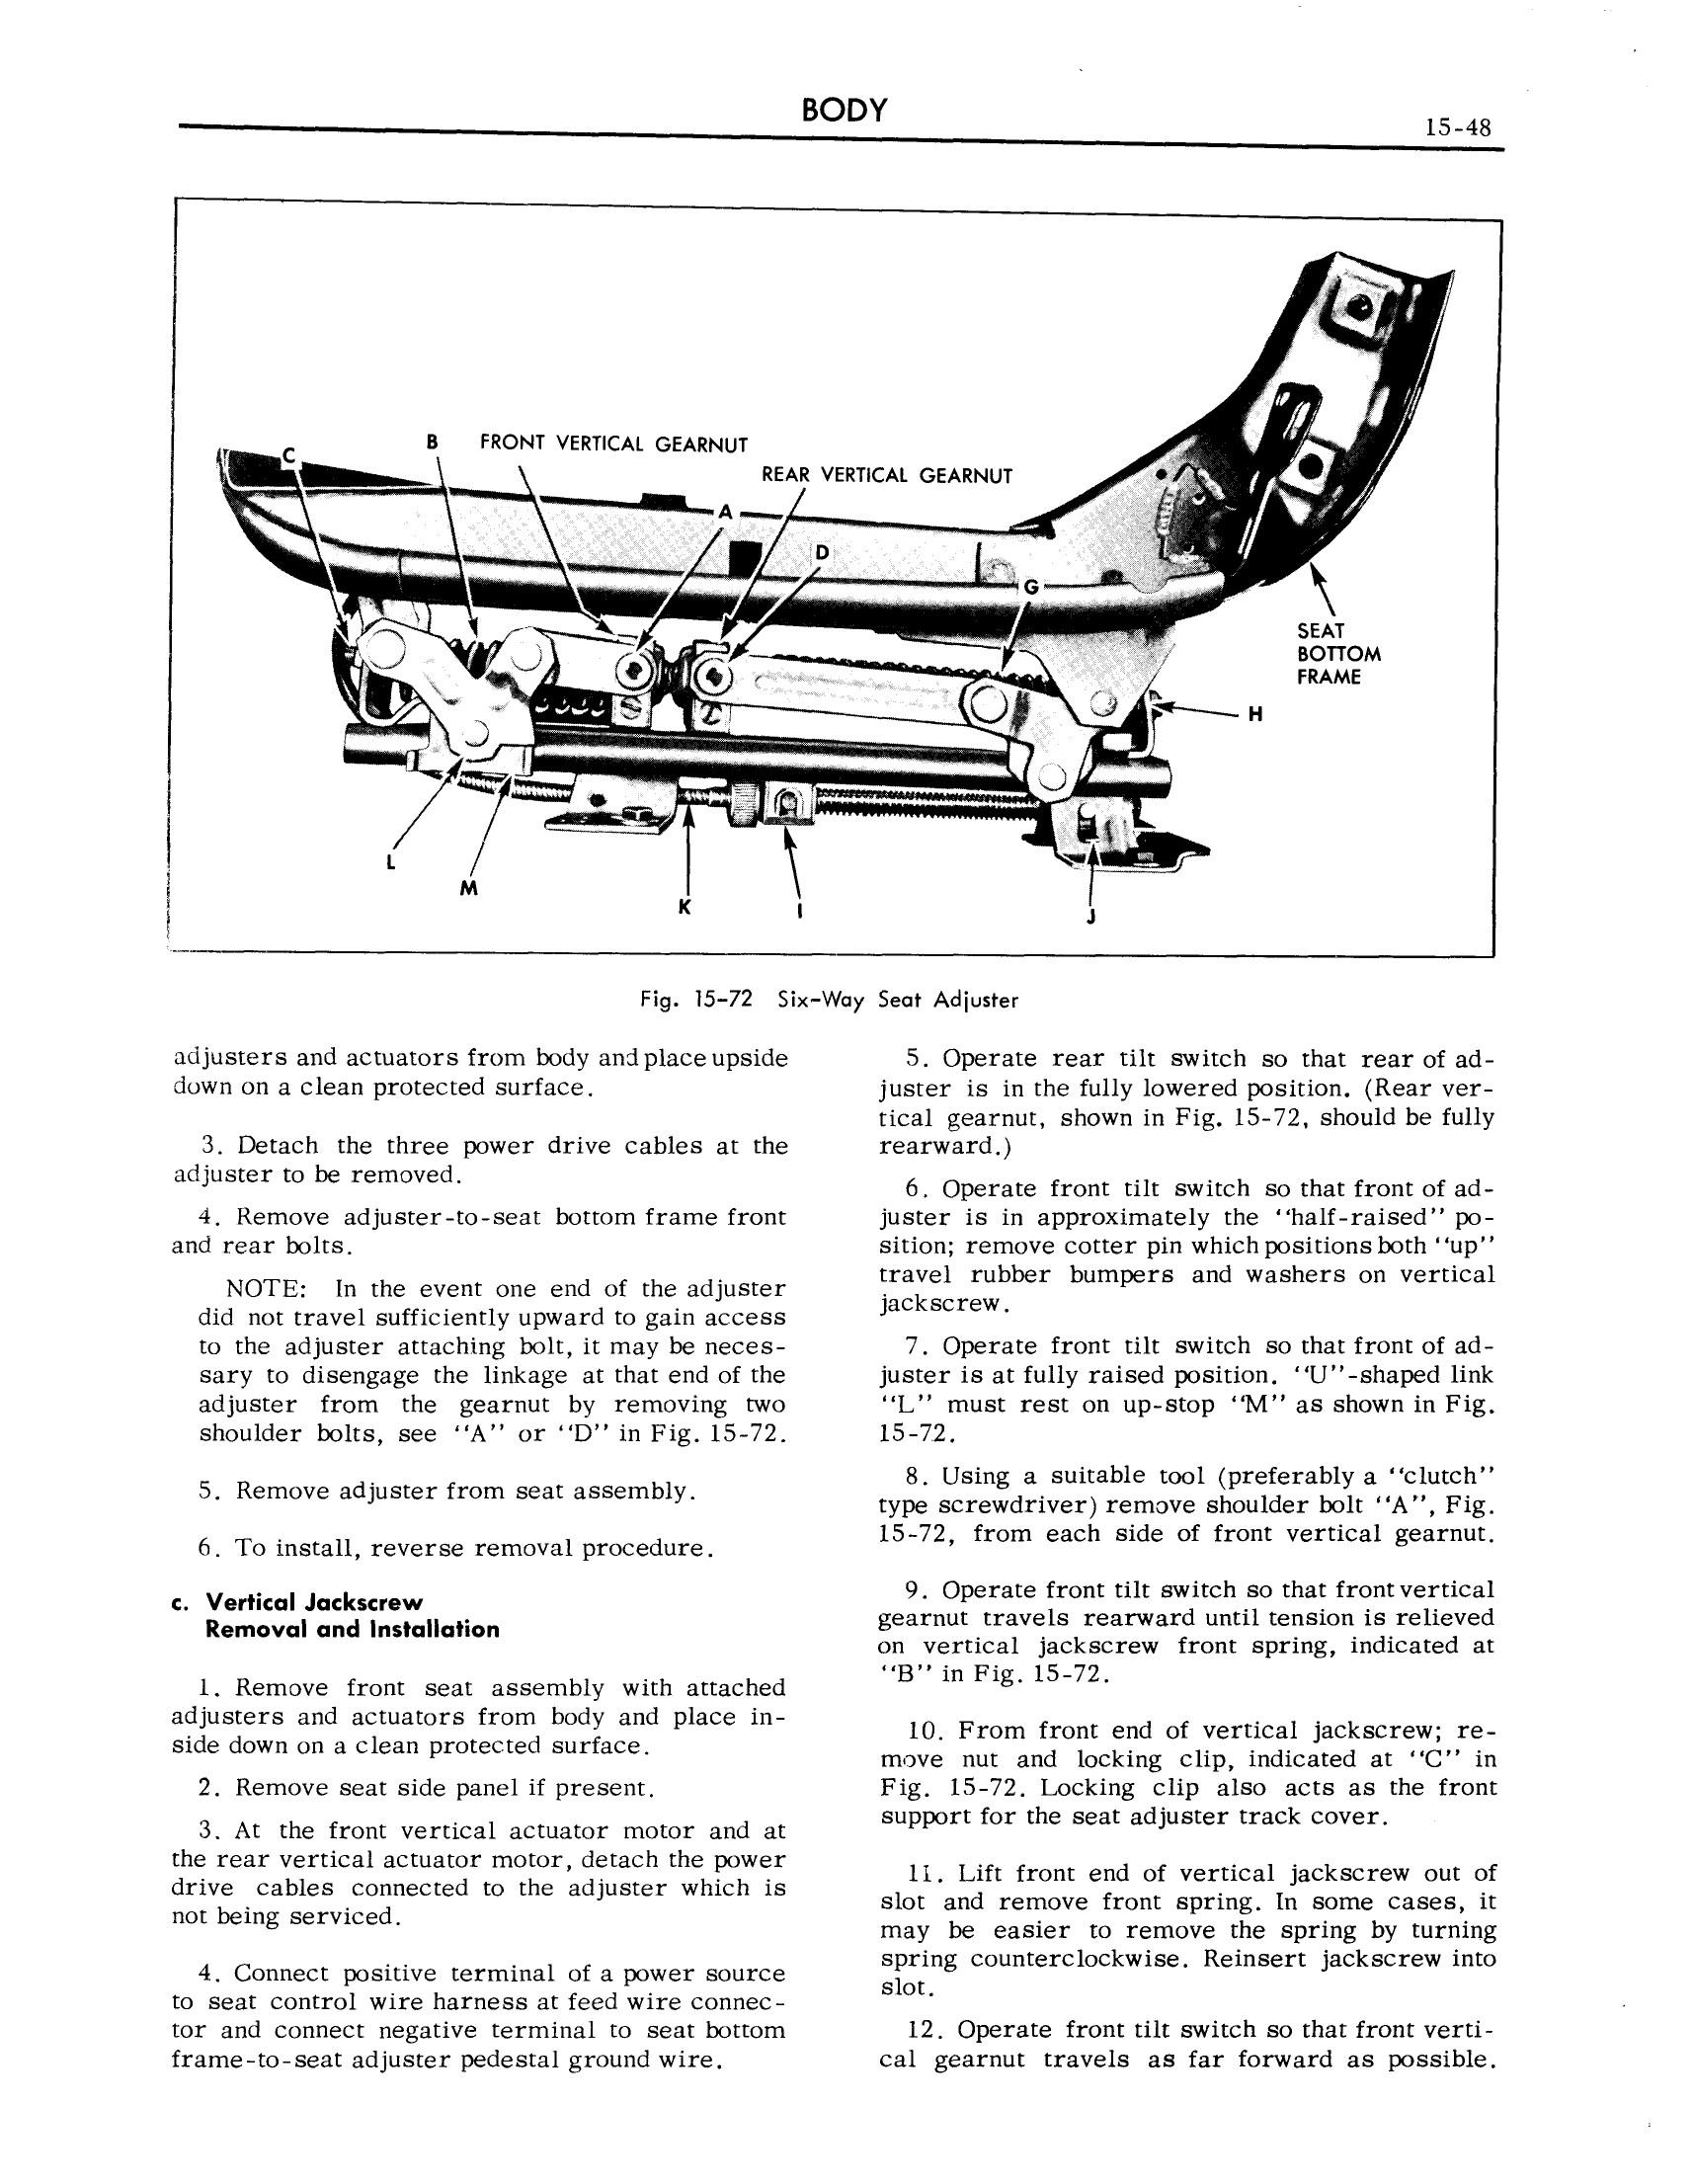 1959 Cadillac Shop Manual- Body Page 48 of 99